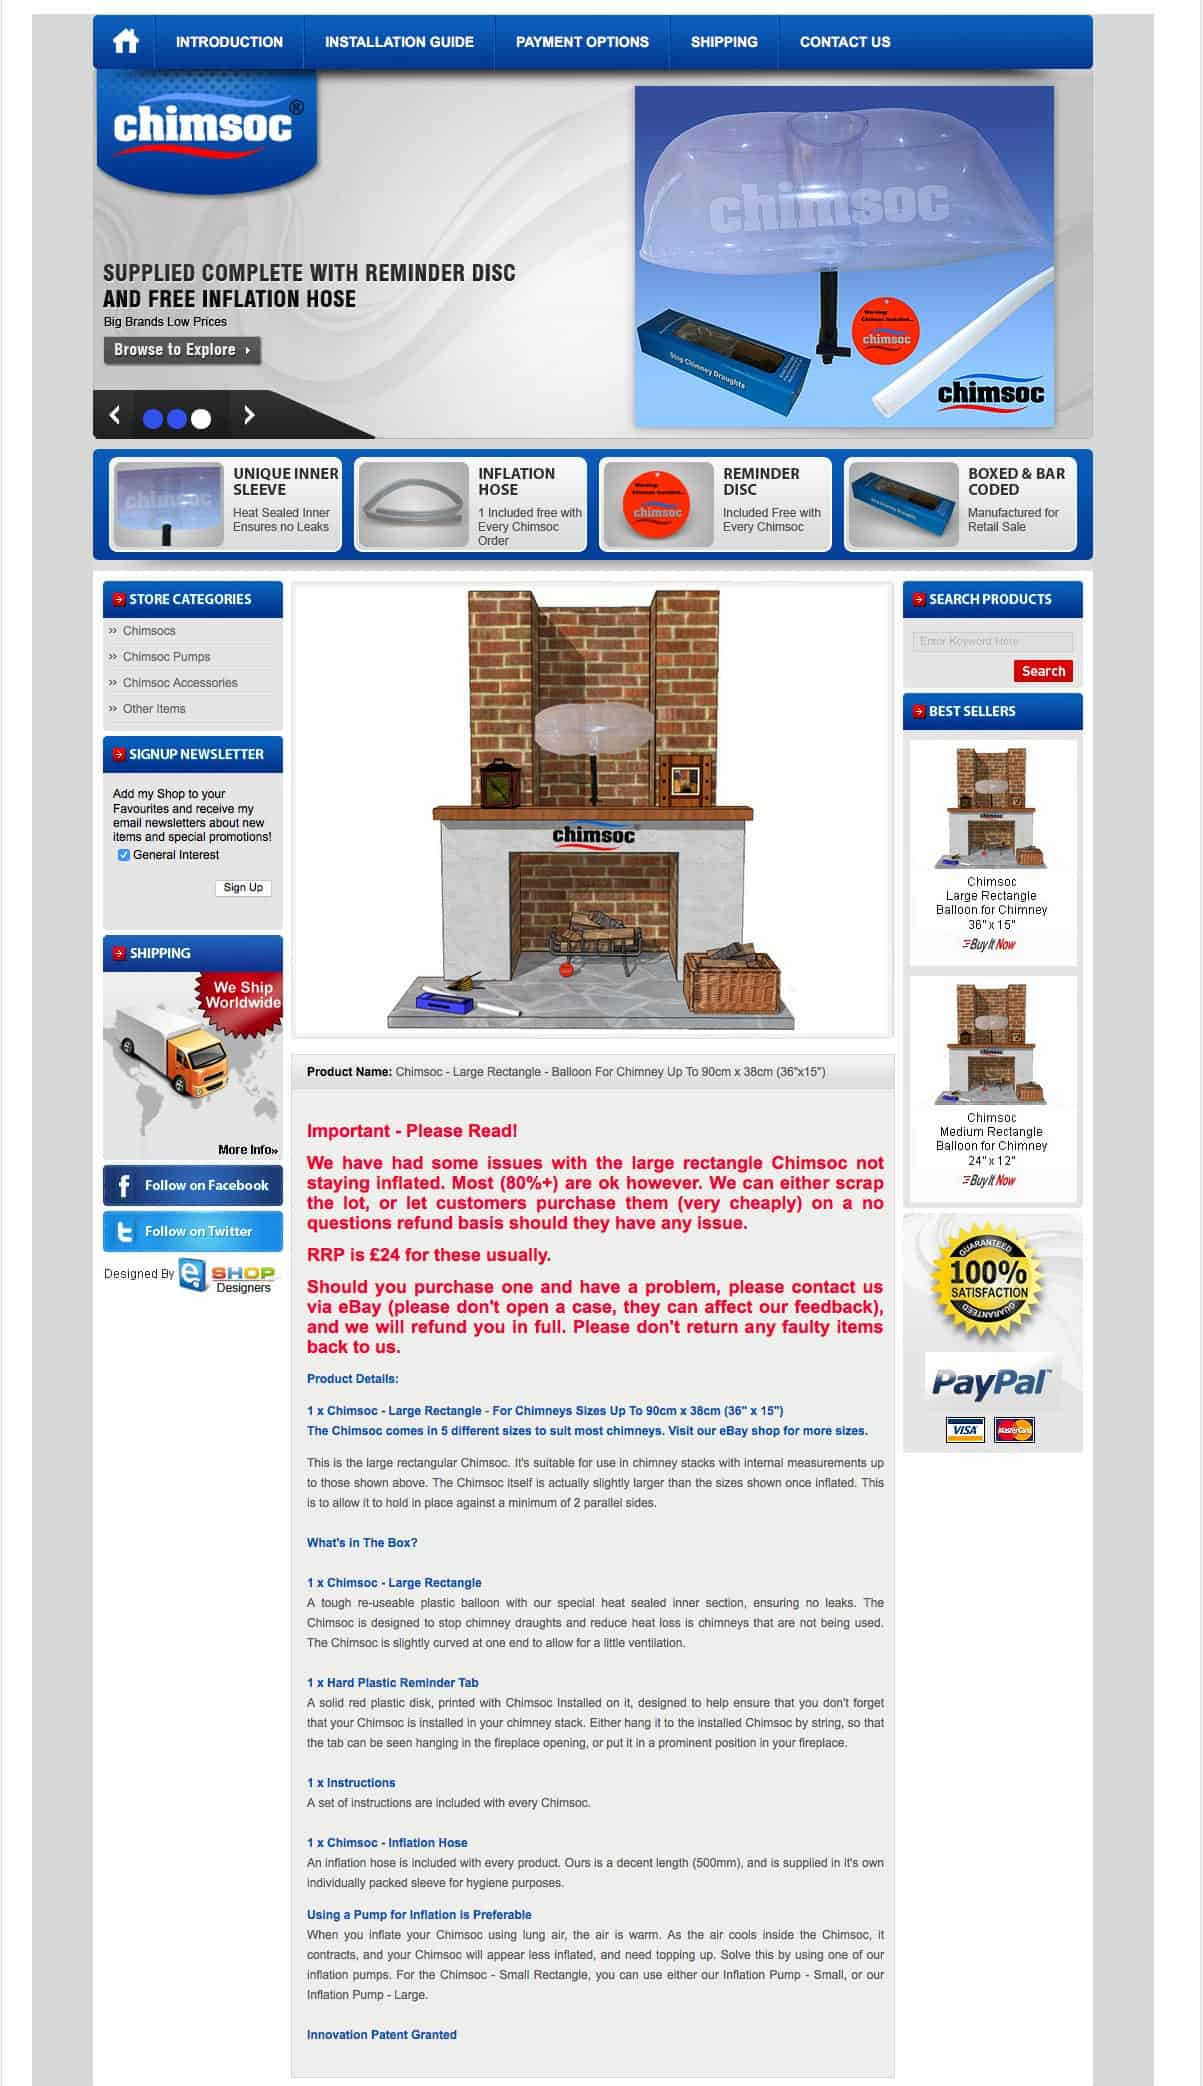 Chimsoc Ecommerce Website Designers